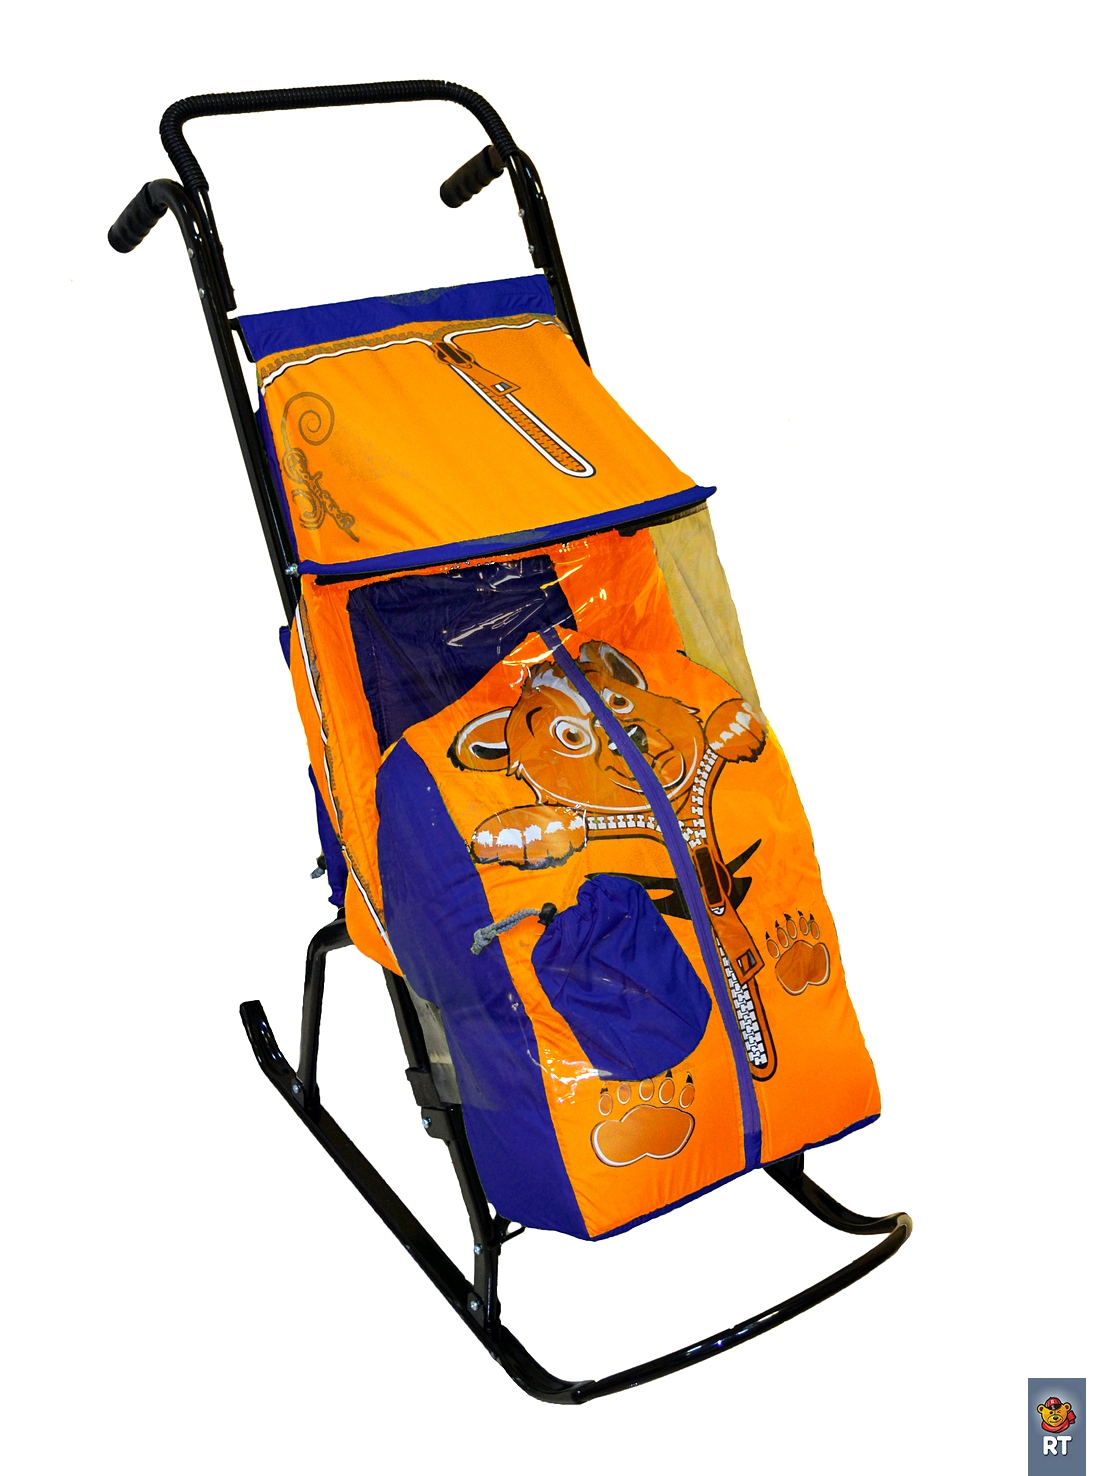 Санки-коляска - Снегурочка-2-Р – Медвежонок, цвет синий-оранжевыйСанки и сани-коляски<br>Санки-коляска - Снегурочка-2-Р – Медвежонок, цвет синий-оранжевый<br>